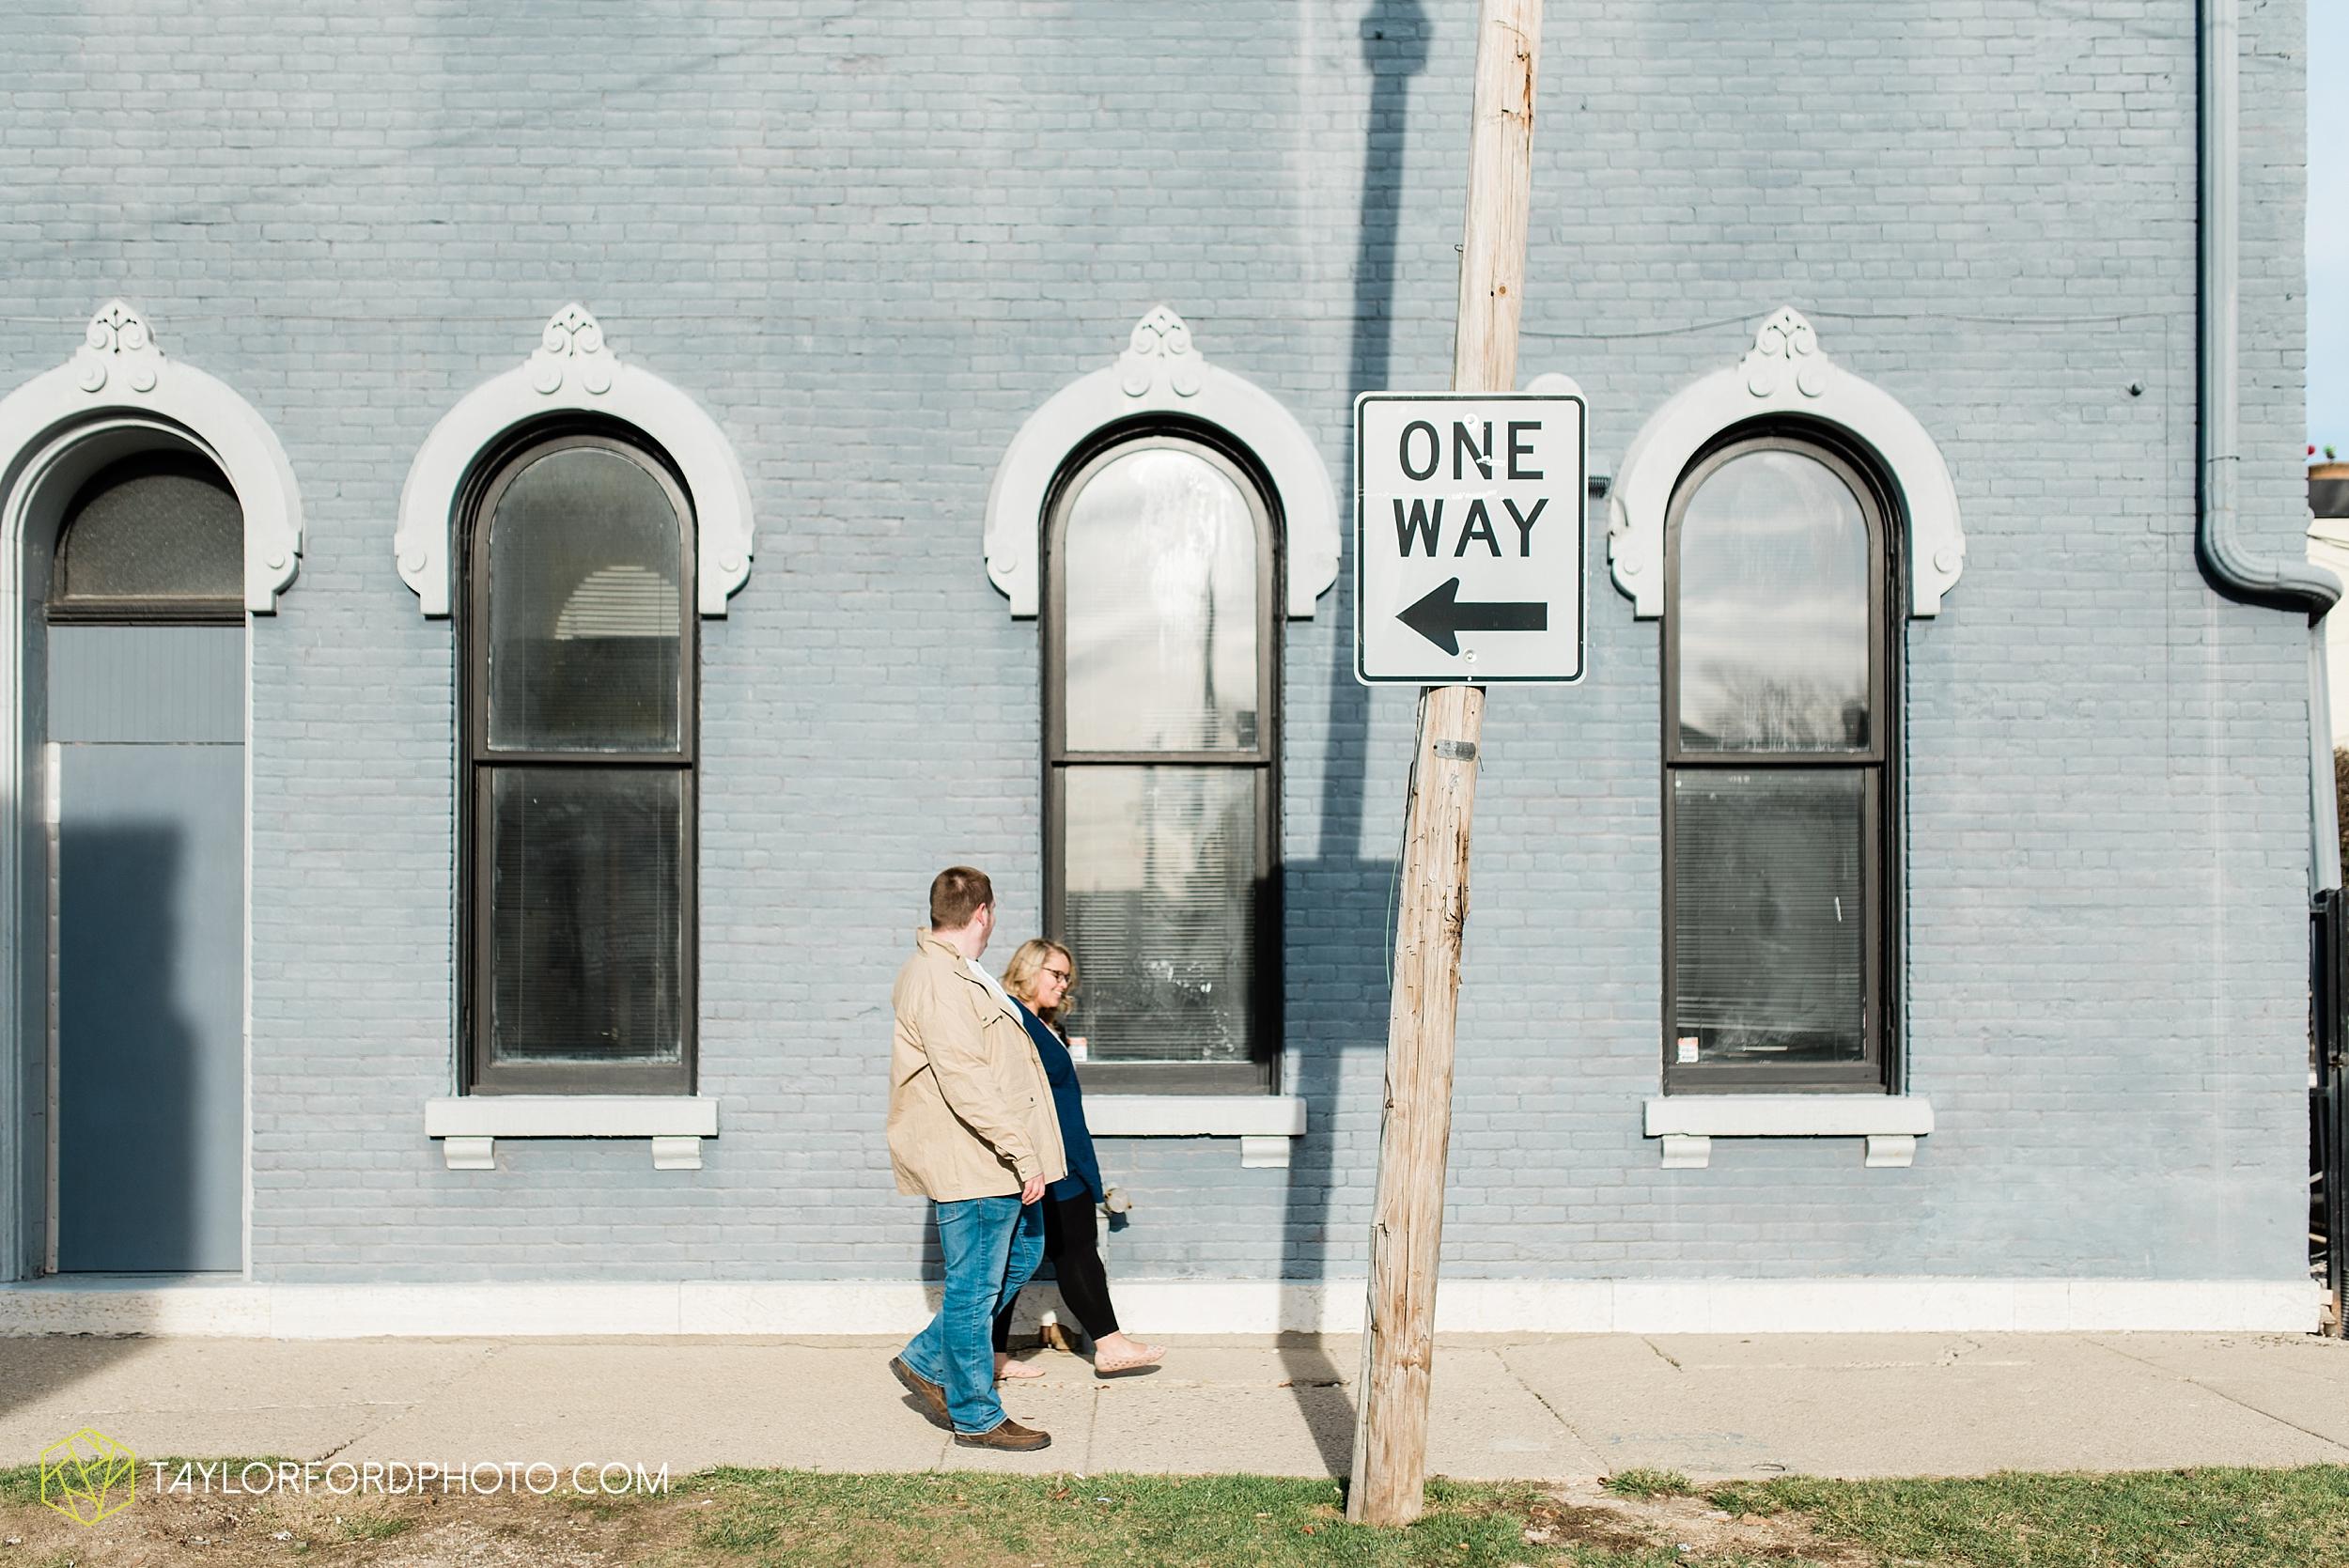 dayton-ohio-engagement-photographer-oregon-district-riverfront-metro-Taylor-Ford-Photography_6486.jpg